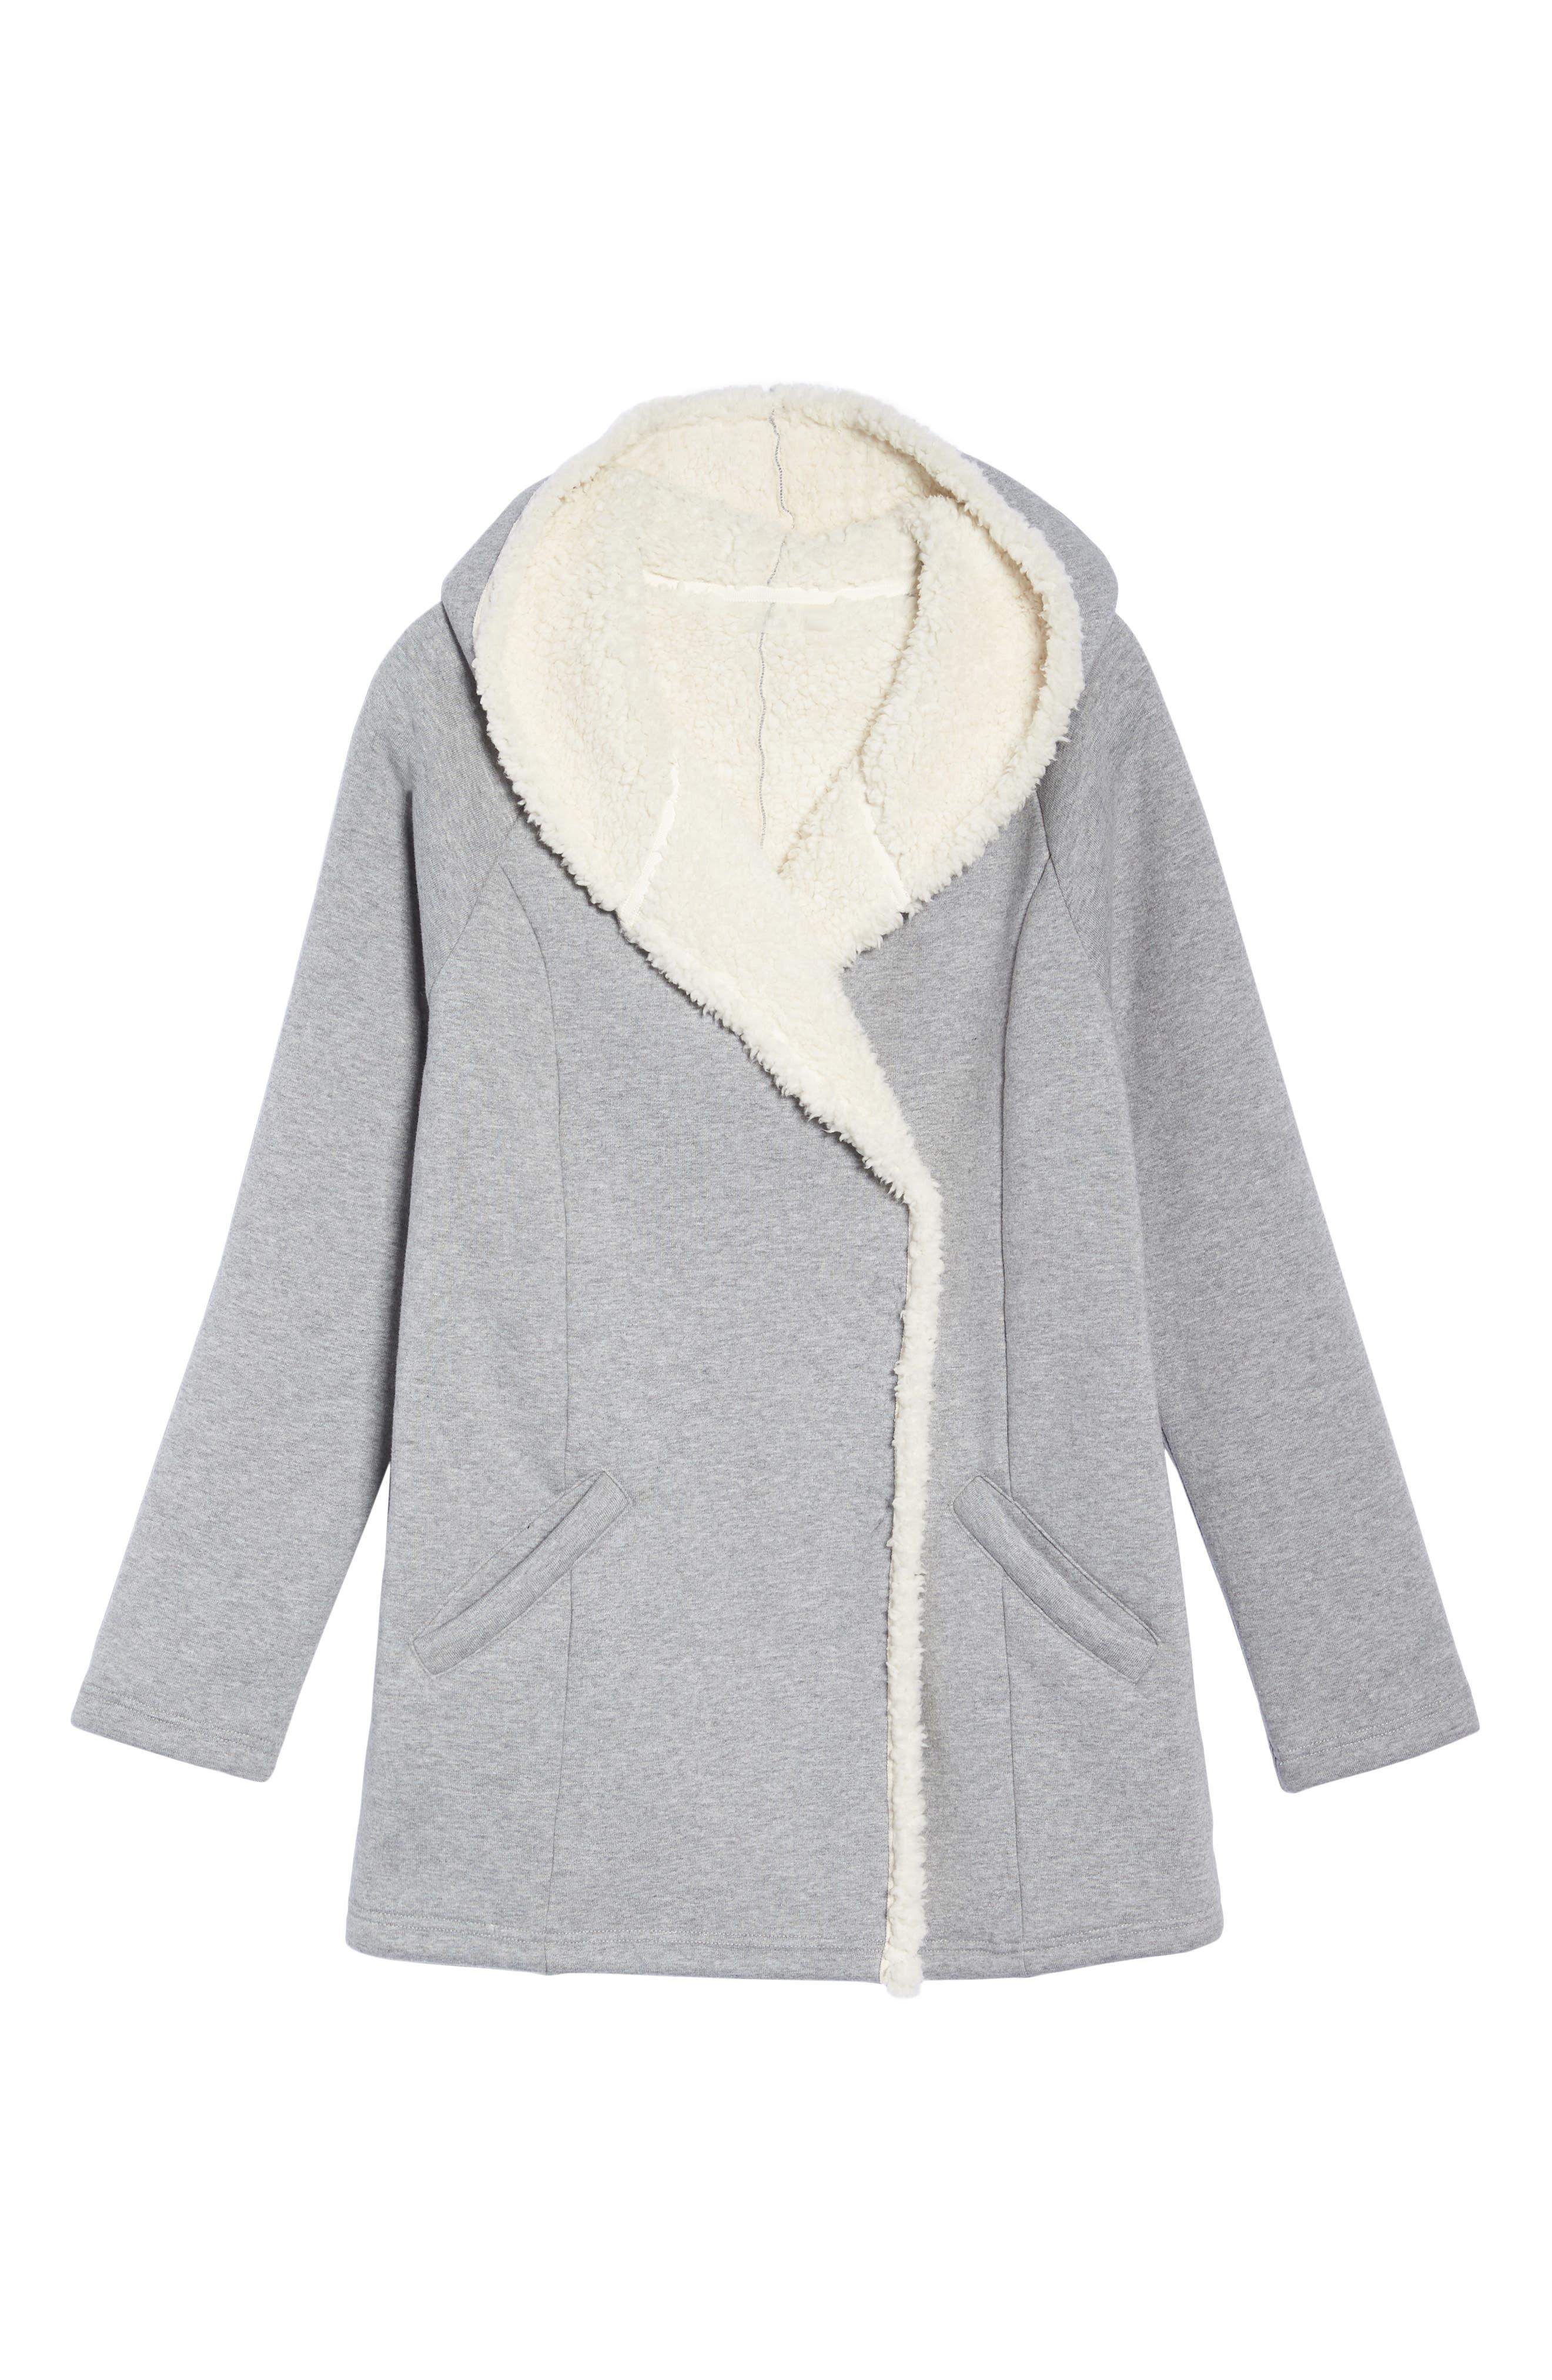 Chalet Fleece Lined Hooded Wrap,                             Alternate thumbnail 6, color,                             030